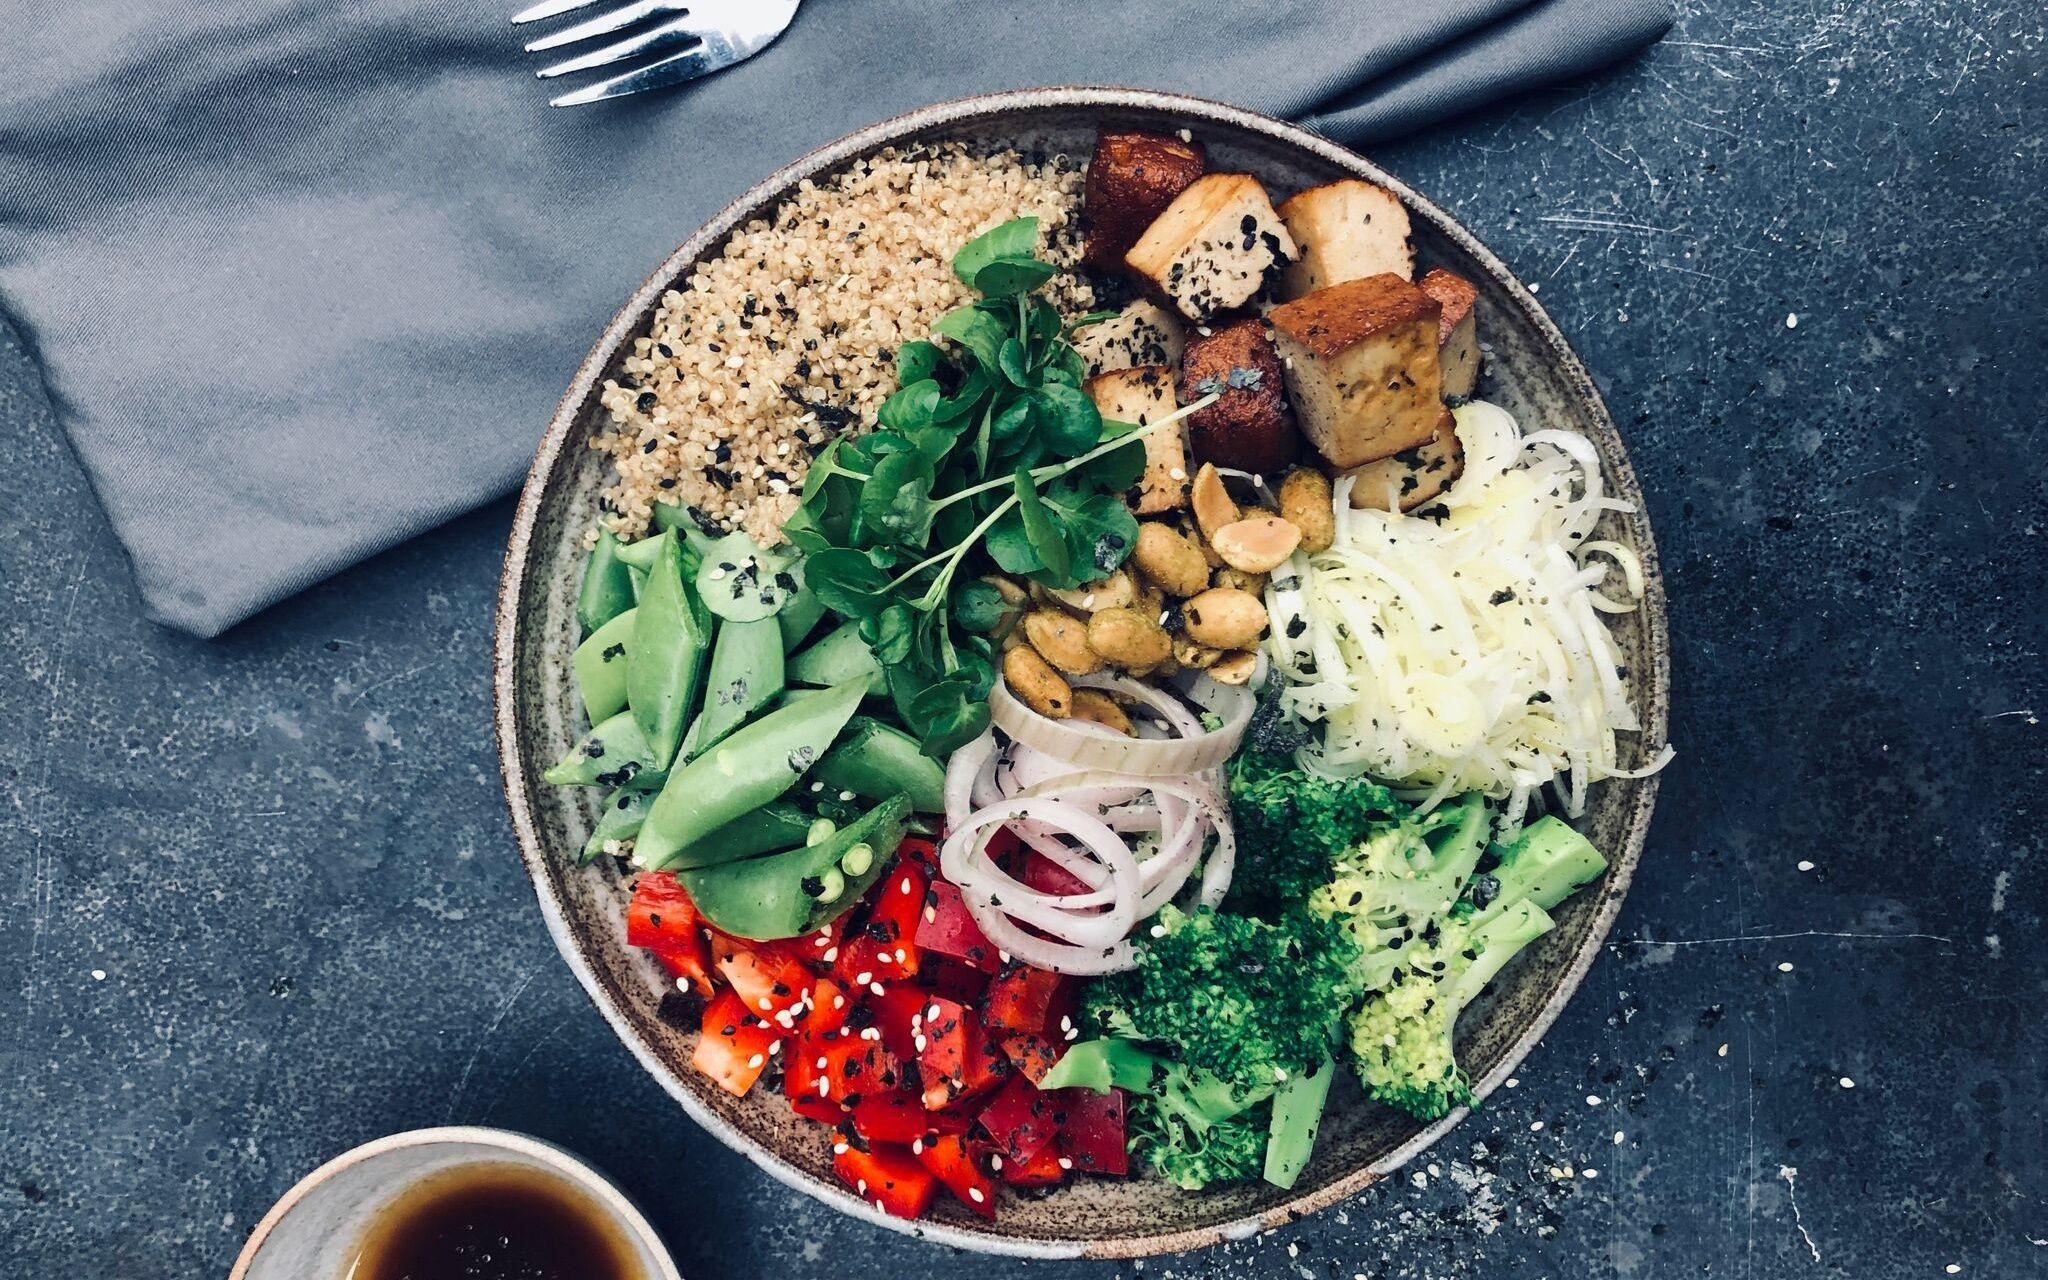 Recept Van Soil Vegan Japanse Wokbowl Met Tofu En Furikaki Strooisel Holistik